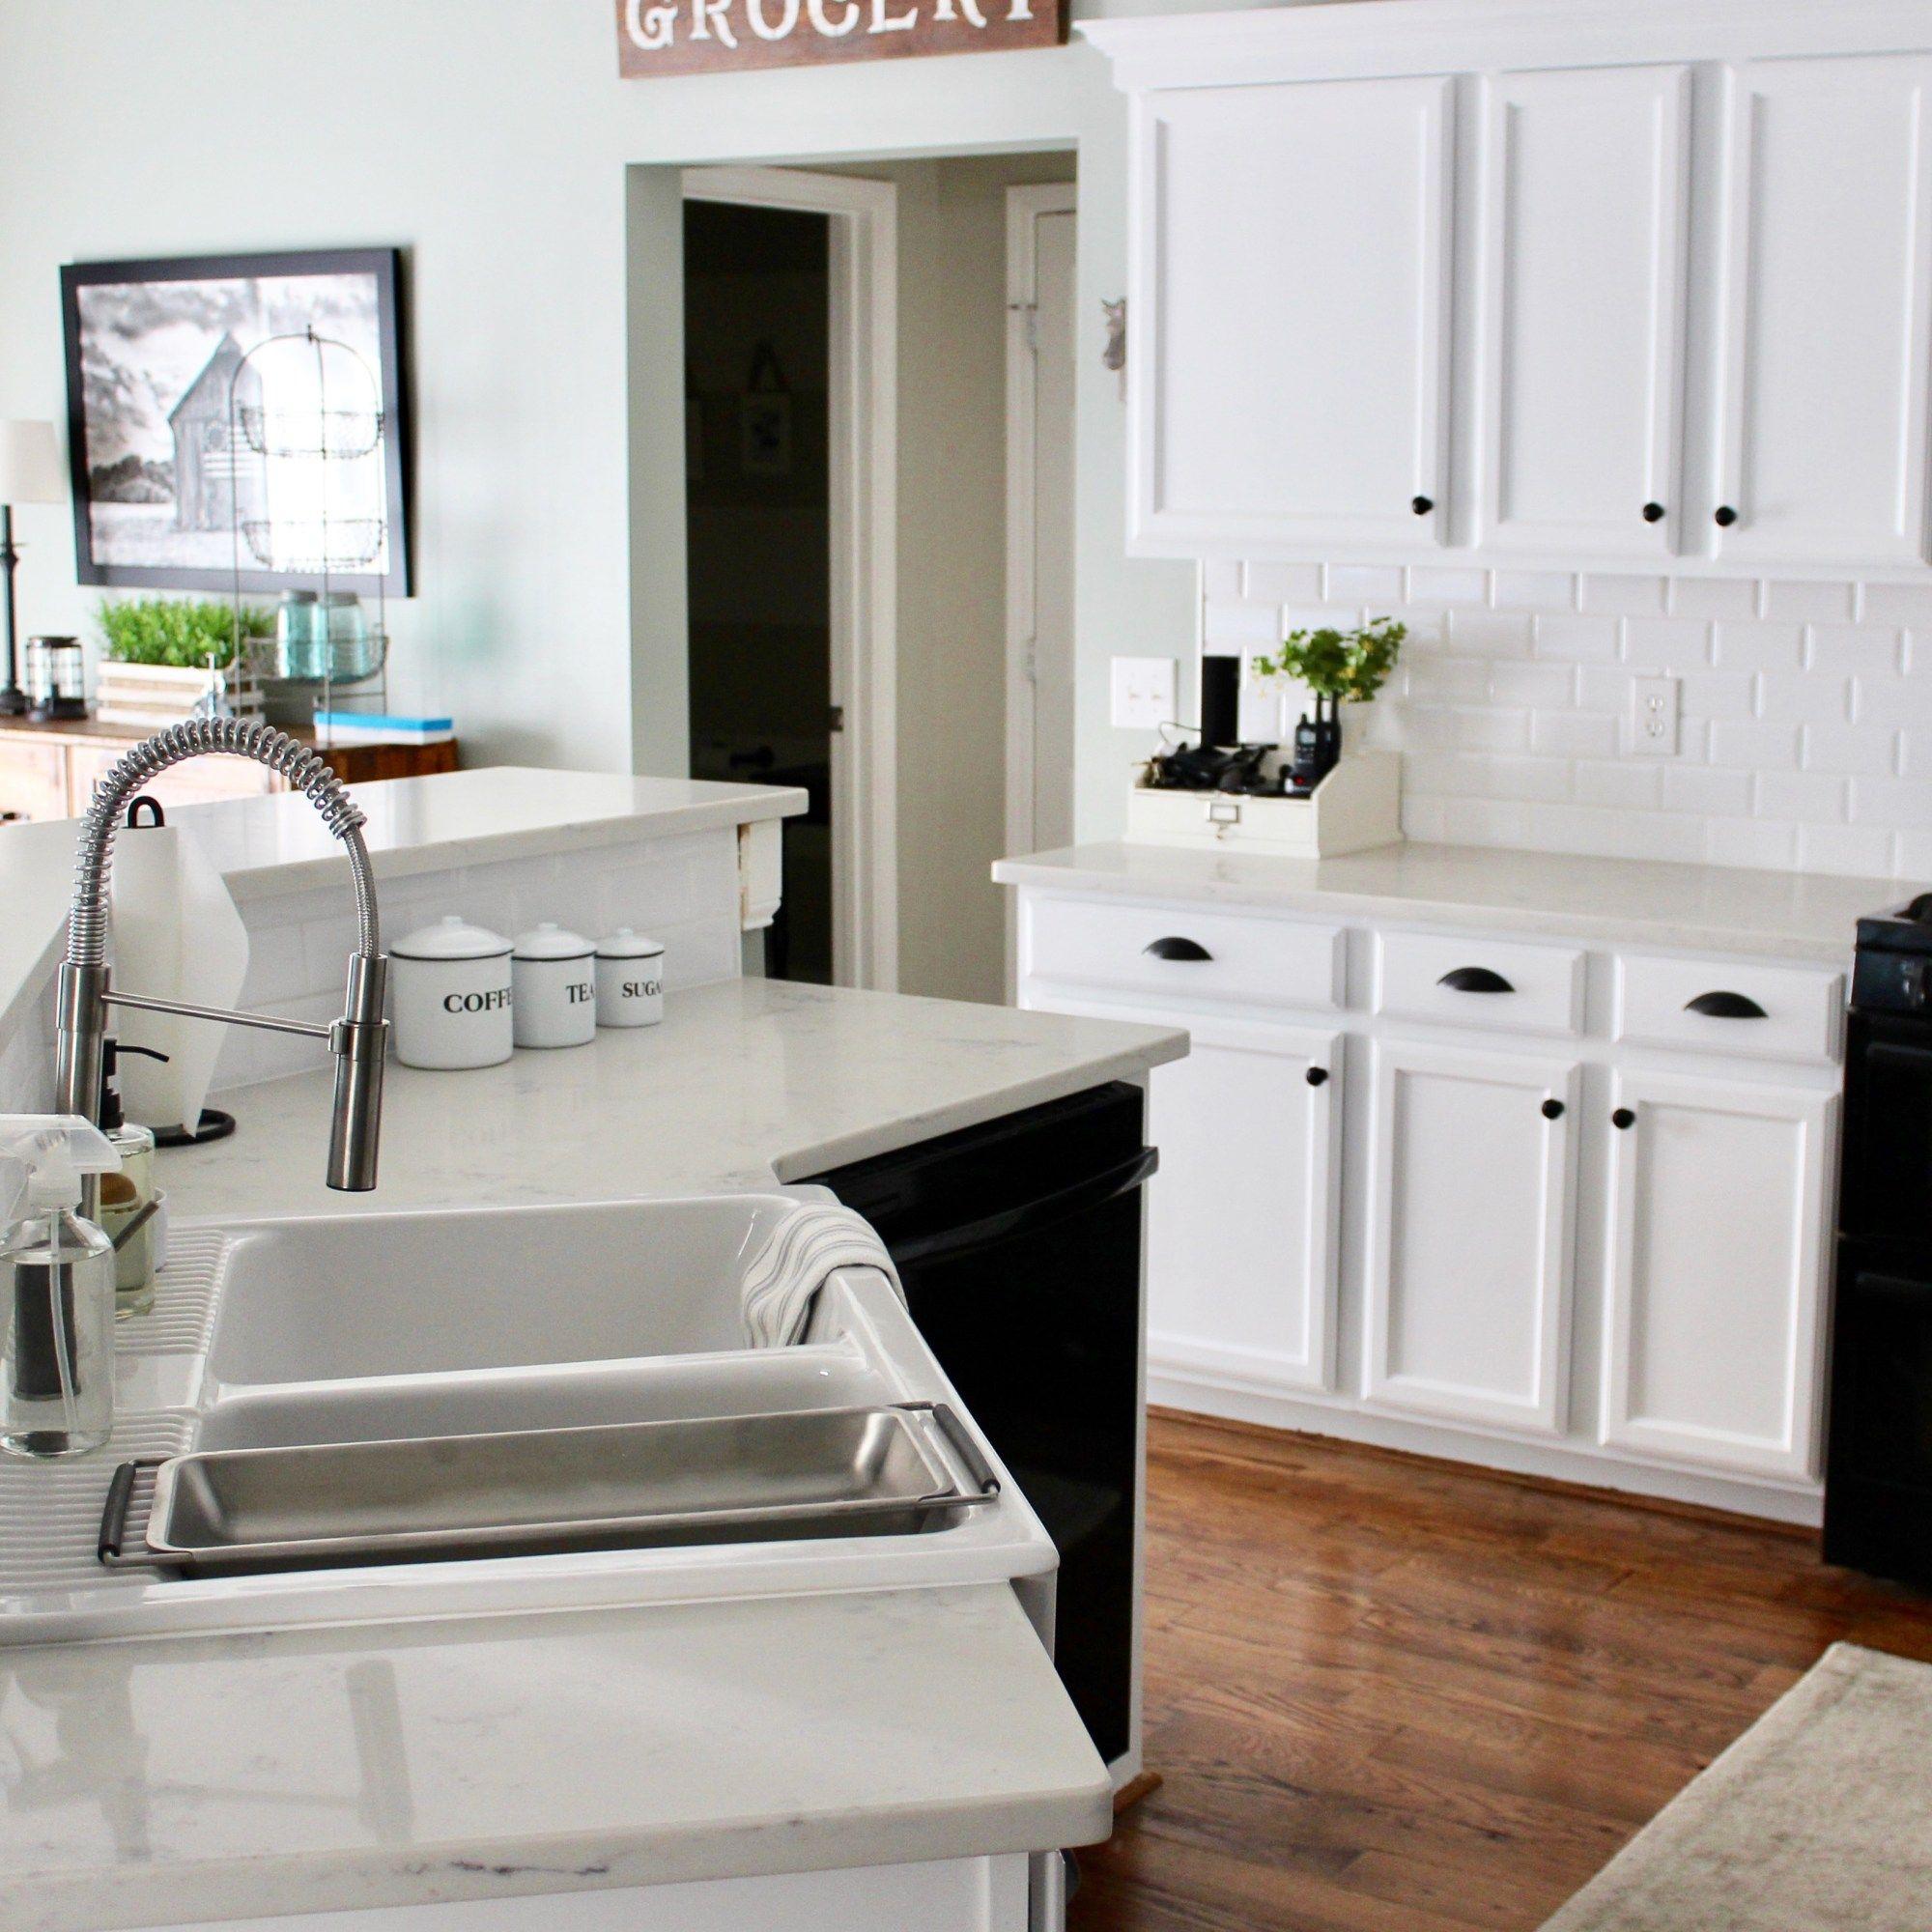 Ikea farmhouse sink review with images ikea farmhouse